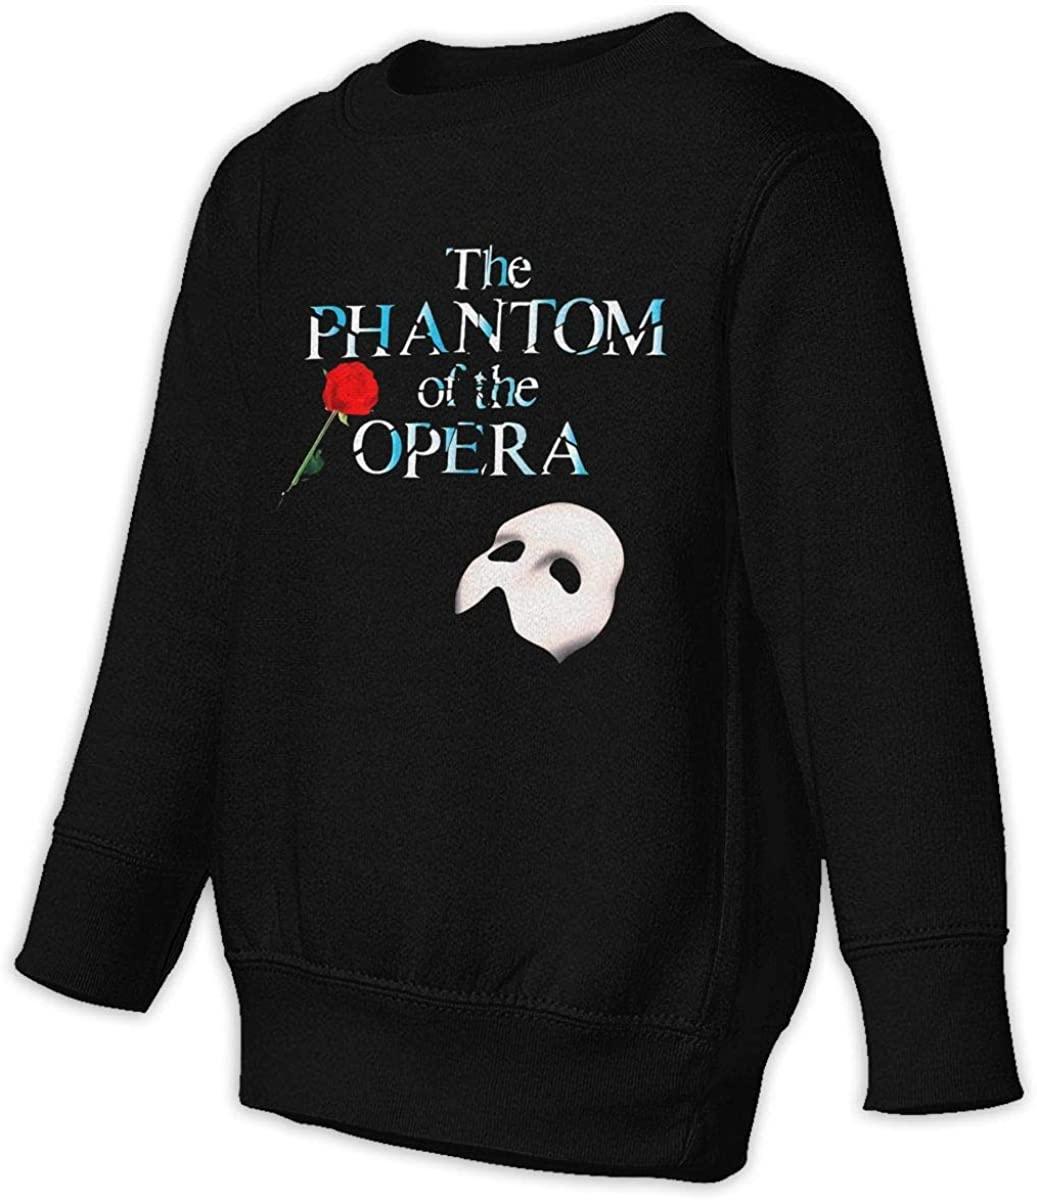 HUOOKFNH-losgusy Phantom of The Opera Rose Unisex Sweatshirt Youth Boy and Girls Pullover Sweatshirt Black